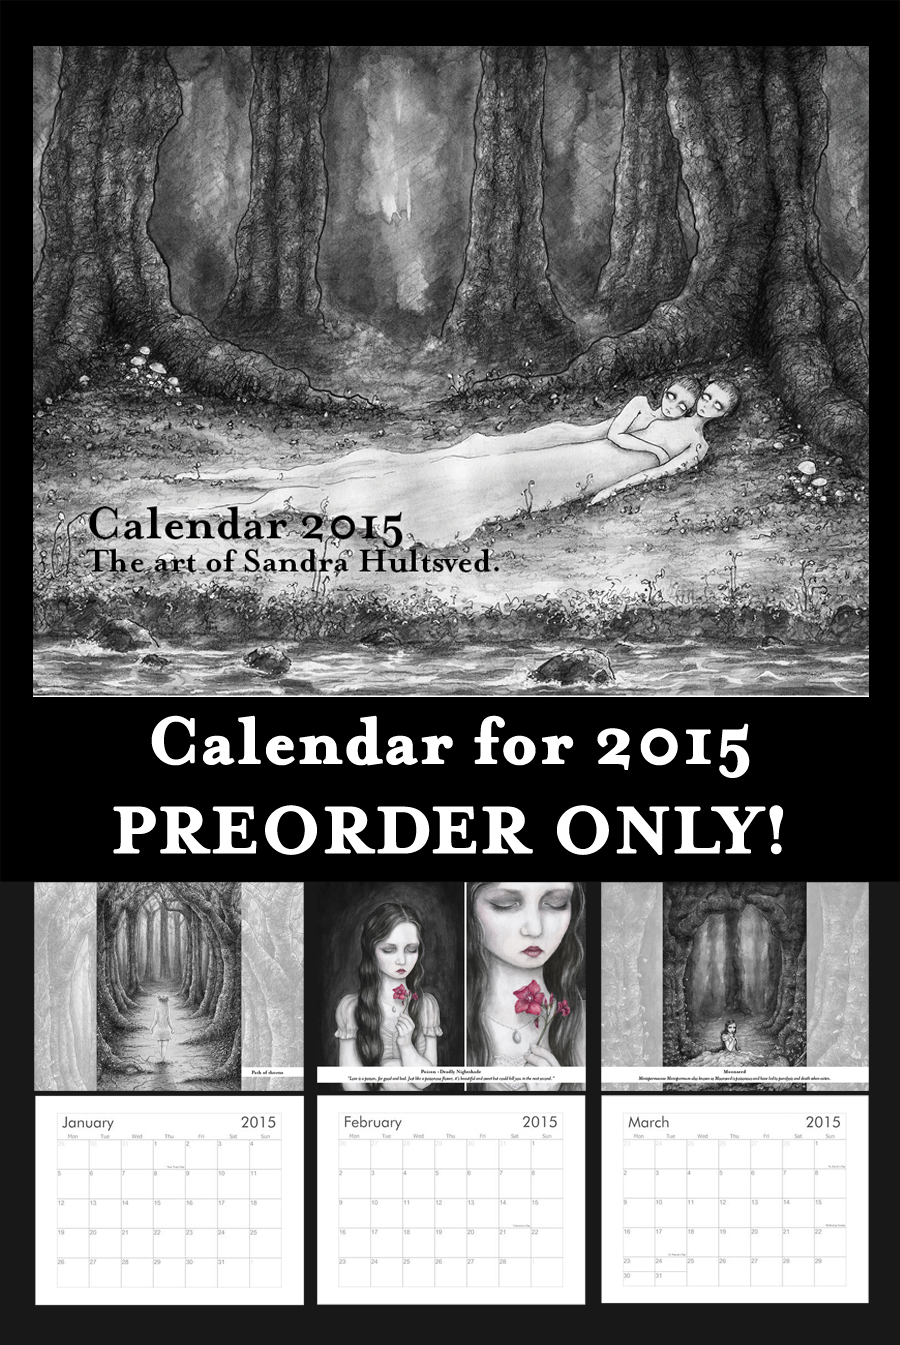 Kalender 2015 webb by SandraHultsved